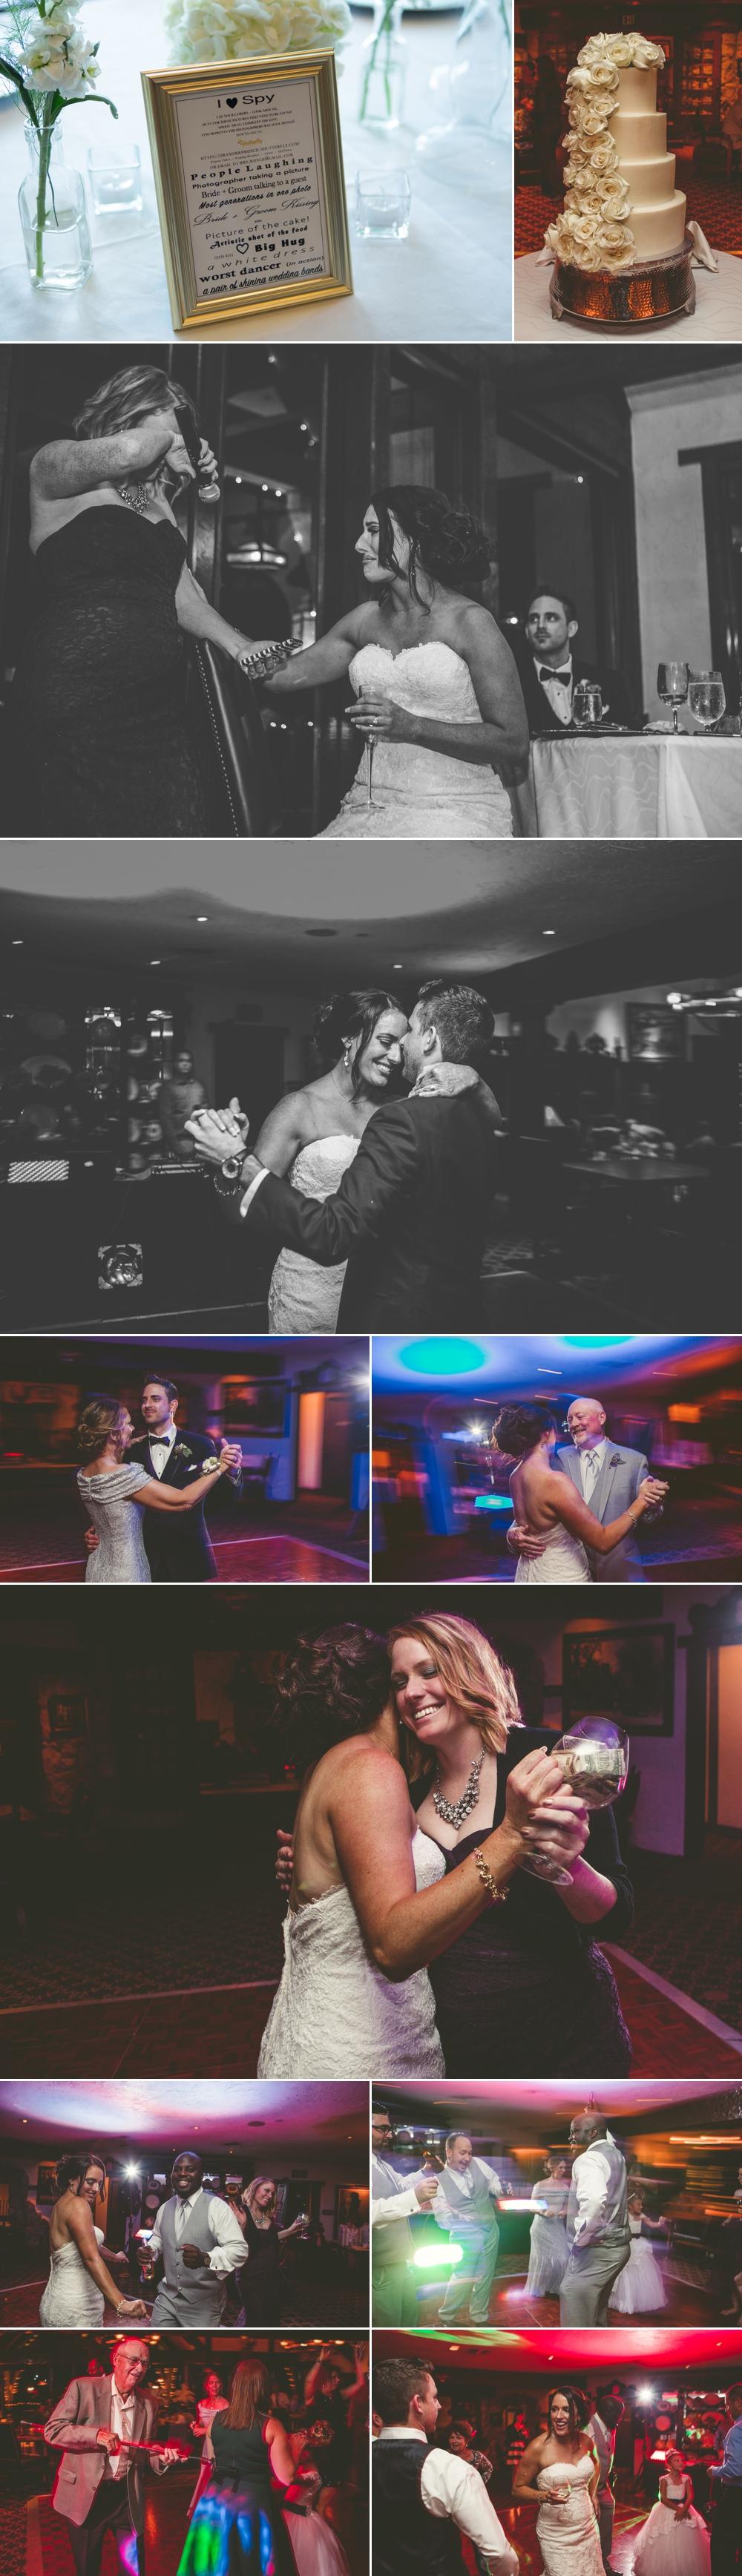 jason_domingues_photography_-best_kansas_city_photographer_big_cedar_lodge_wedding_ozark_kc_missouri_0004